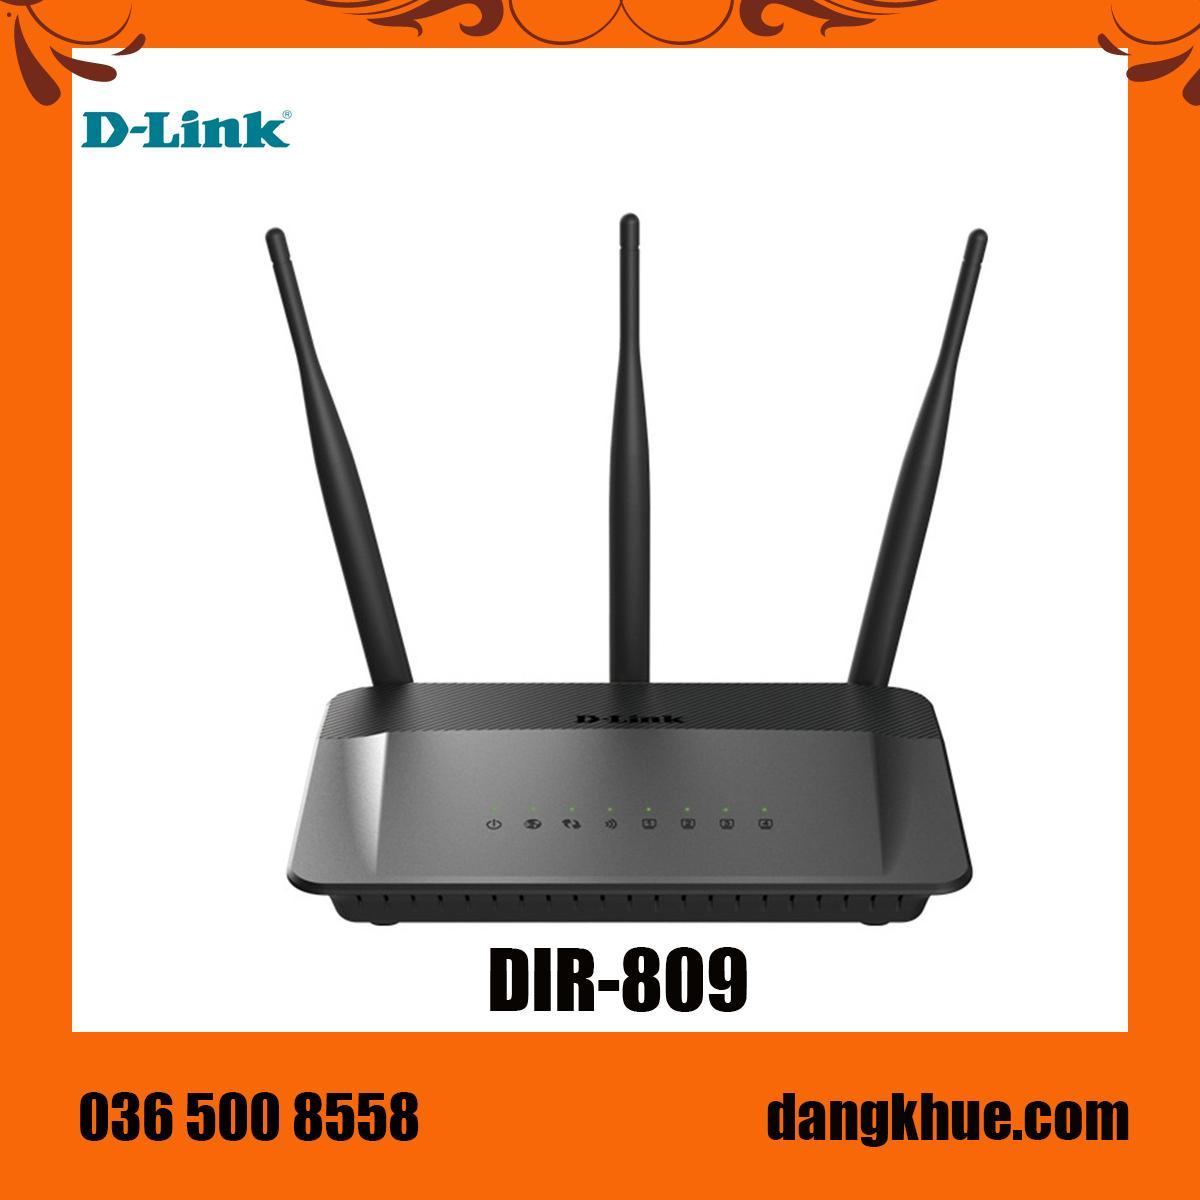 Giá Bộ phát wifi D-Link DIR-809